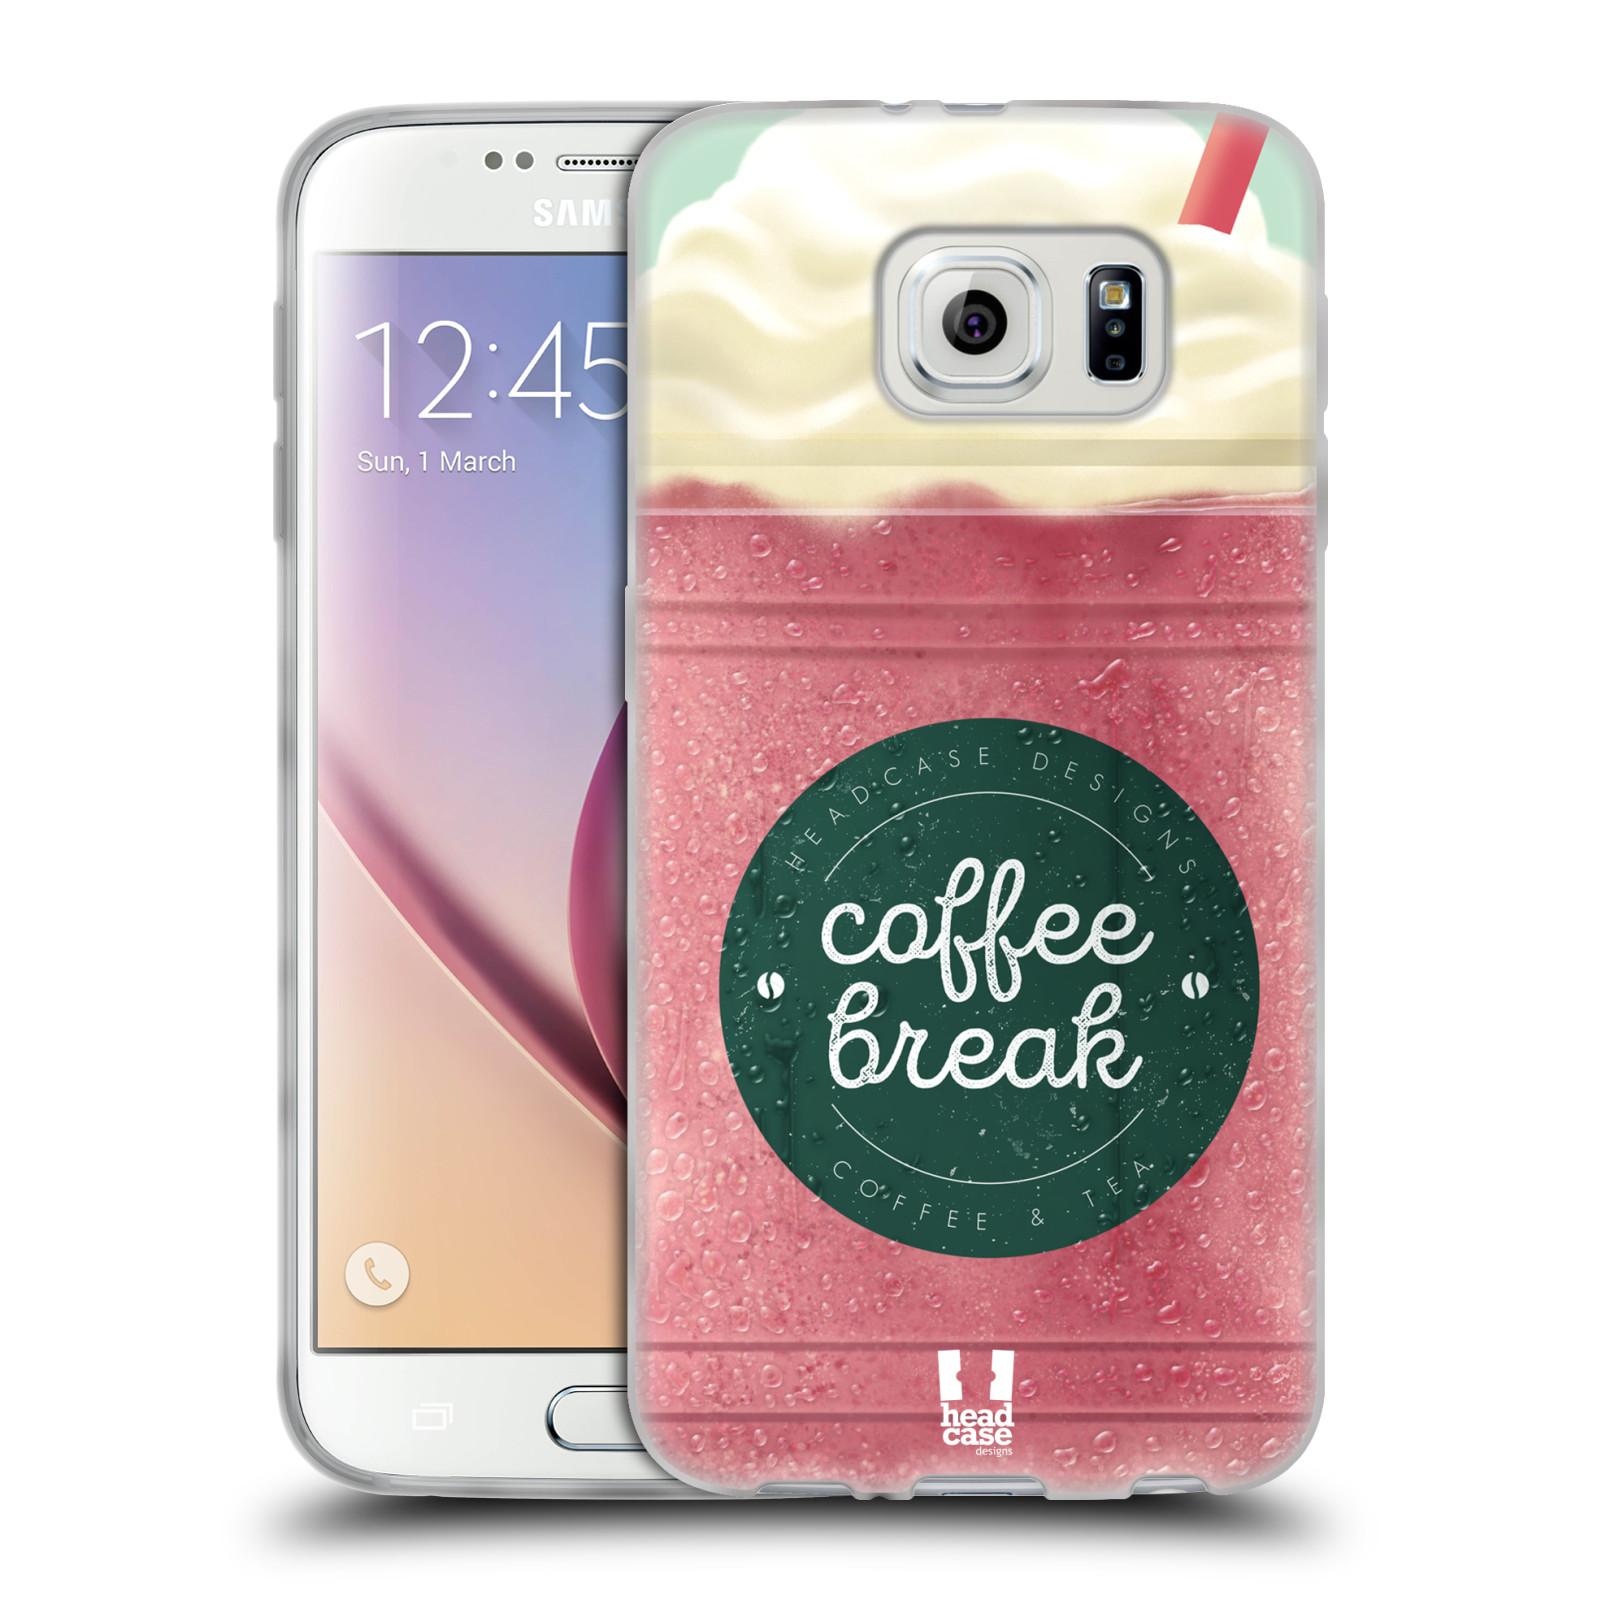 HEAD CASE DESIGNS COFFEE CUPS SOFT GEL CASE FOR SAMSUNG PHONES 1